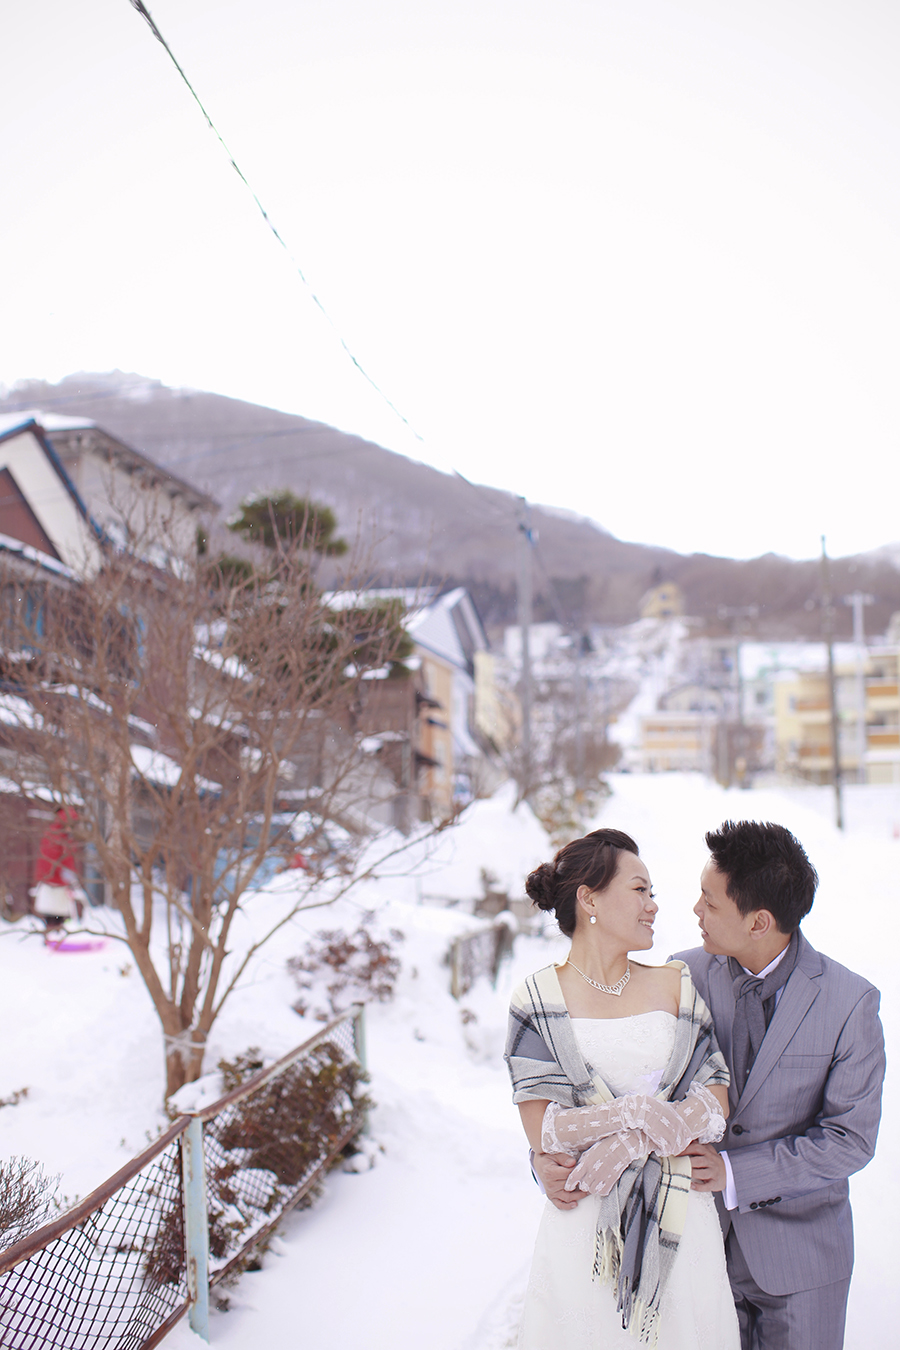 hokkaido tokyo japan . wedding photography by kurt ahs . 5069.jpg